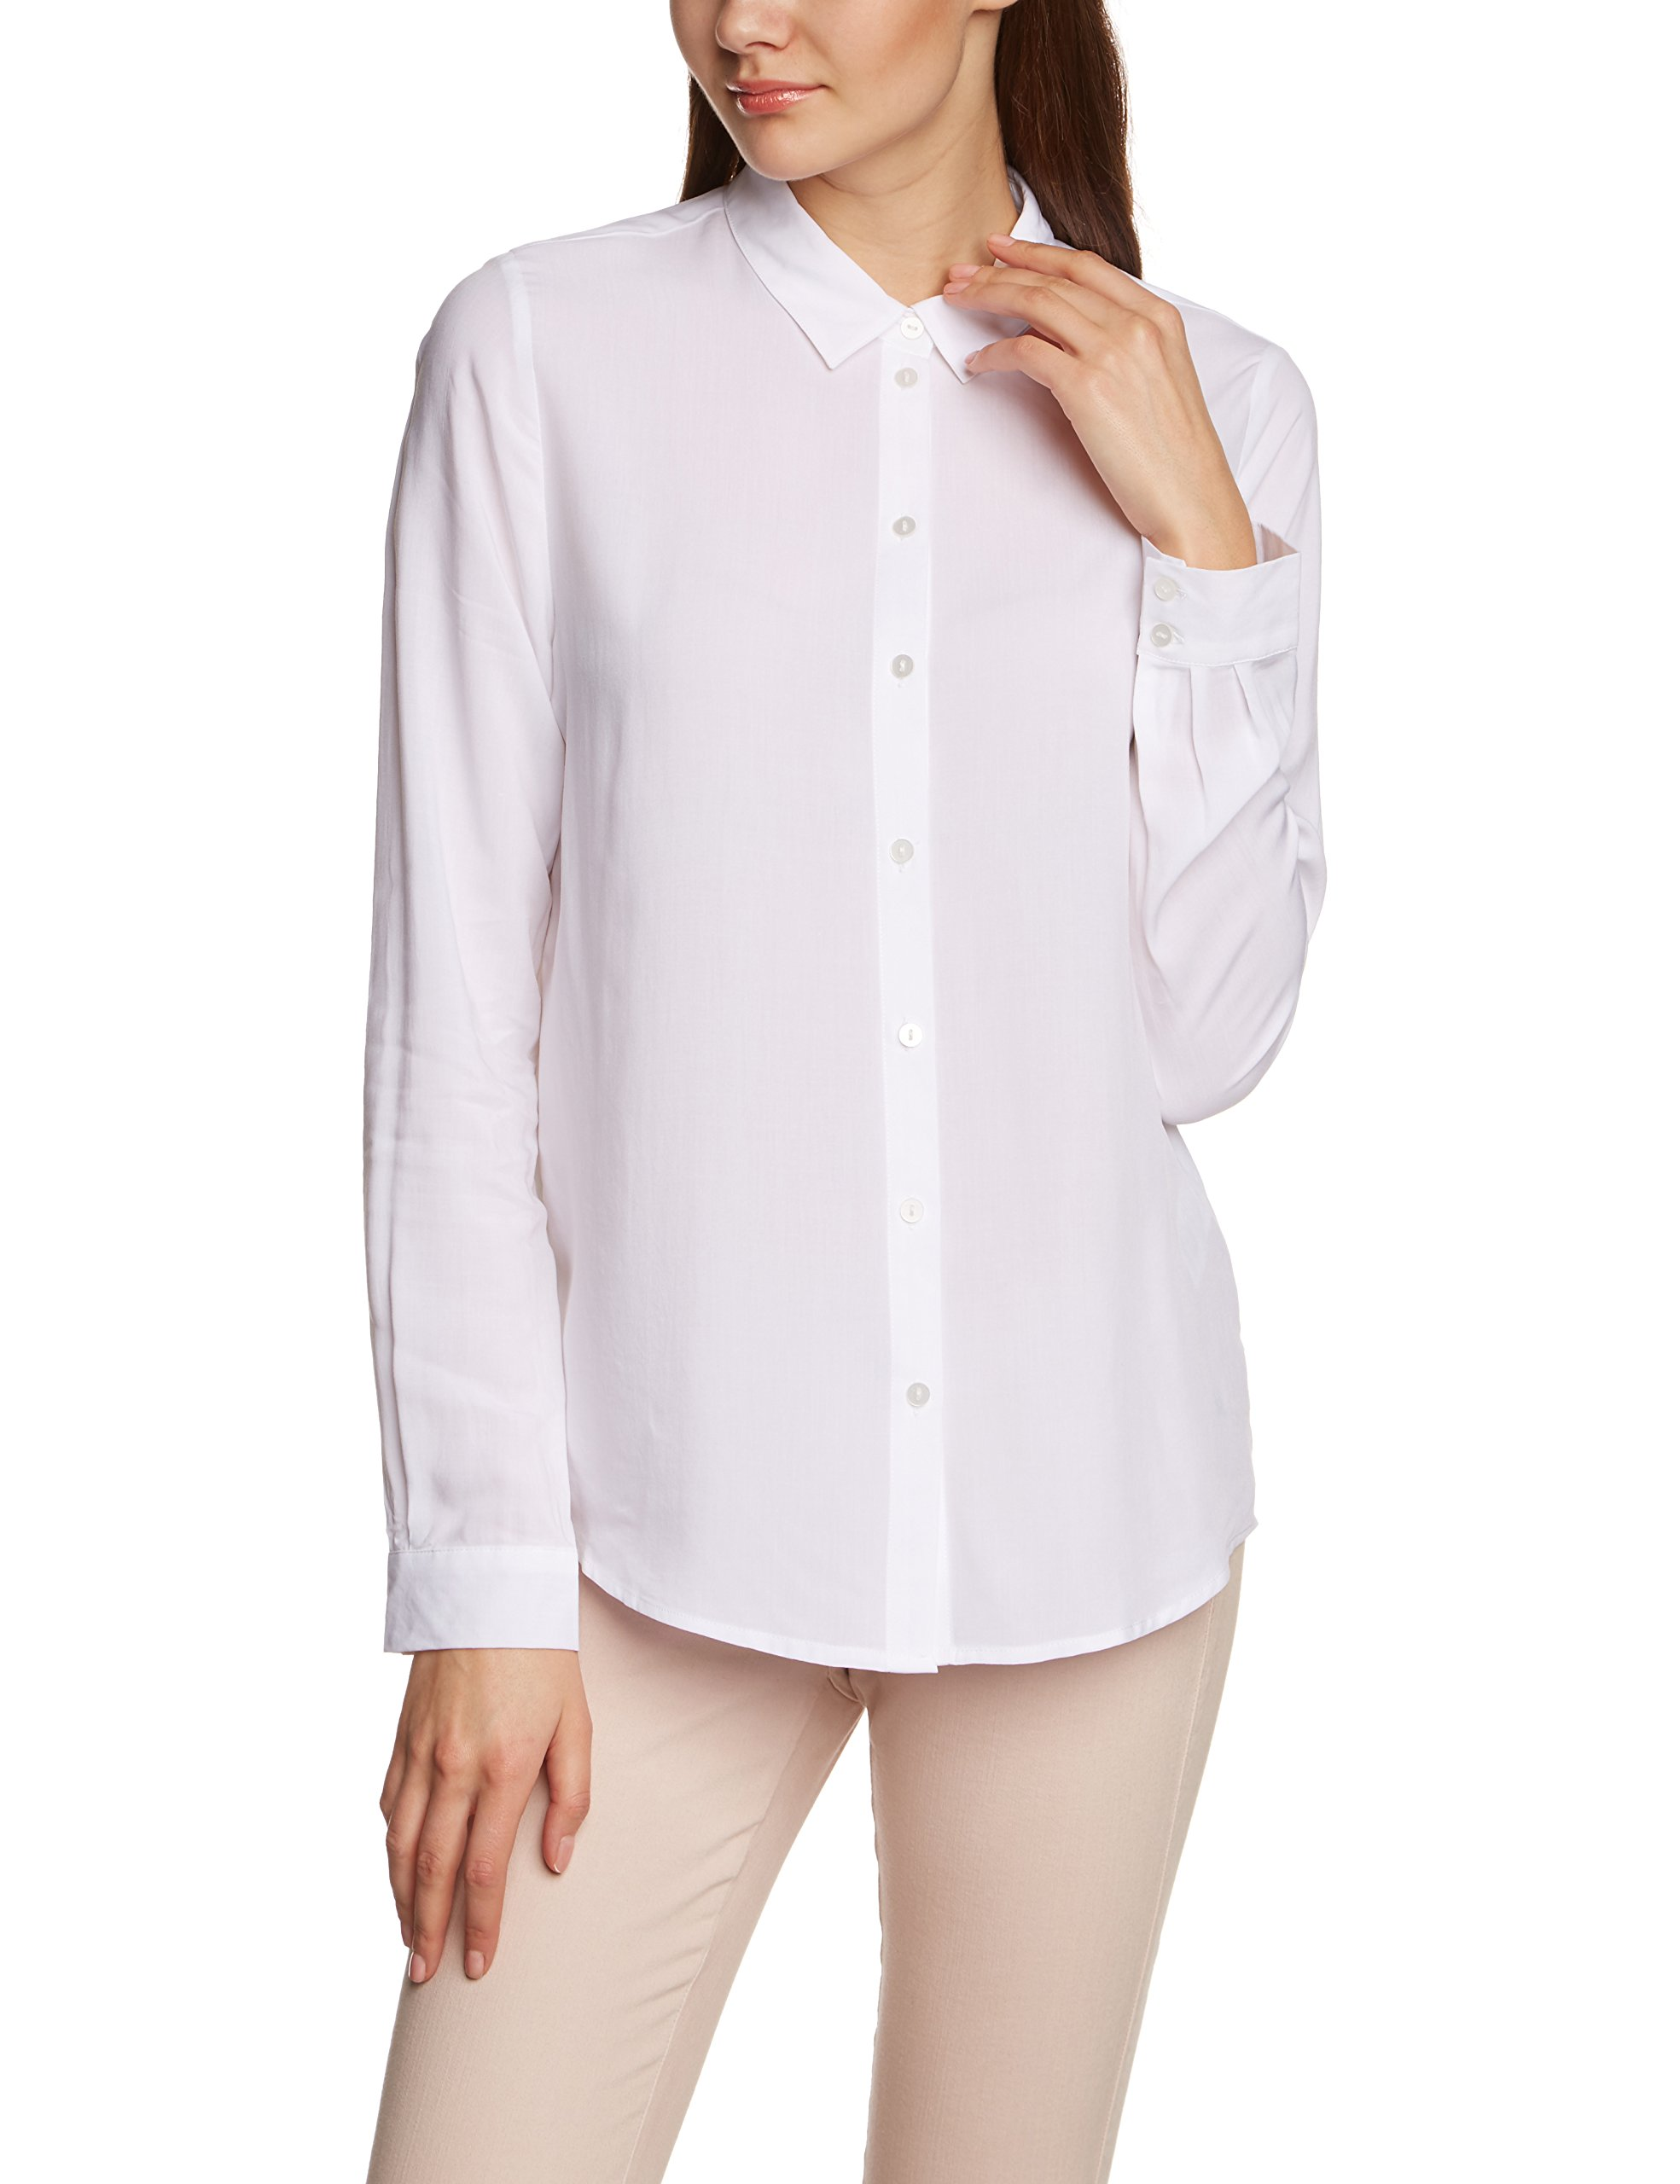 NEW! Блуза SELECTED FEMME (Германия 55€)